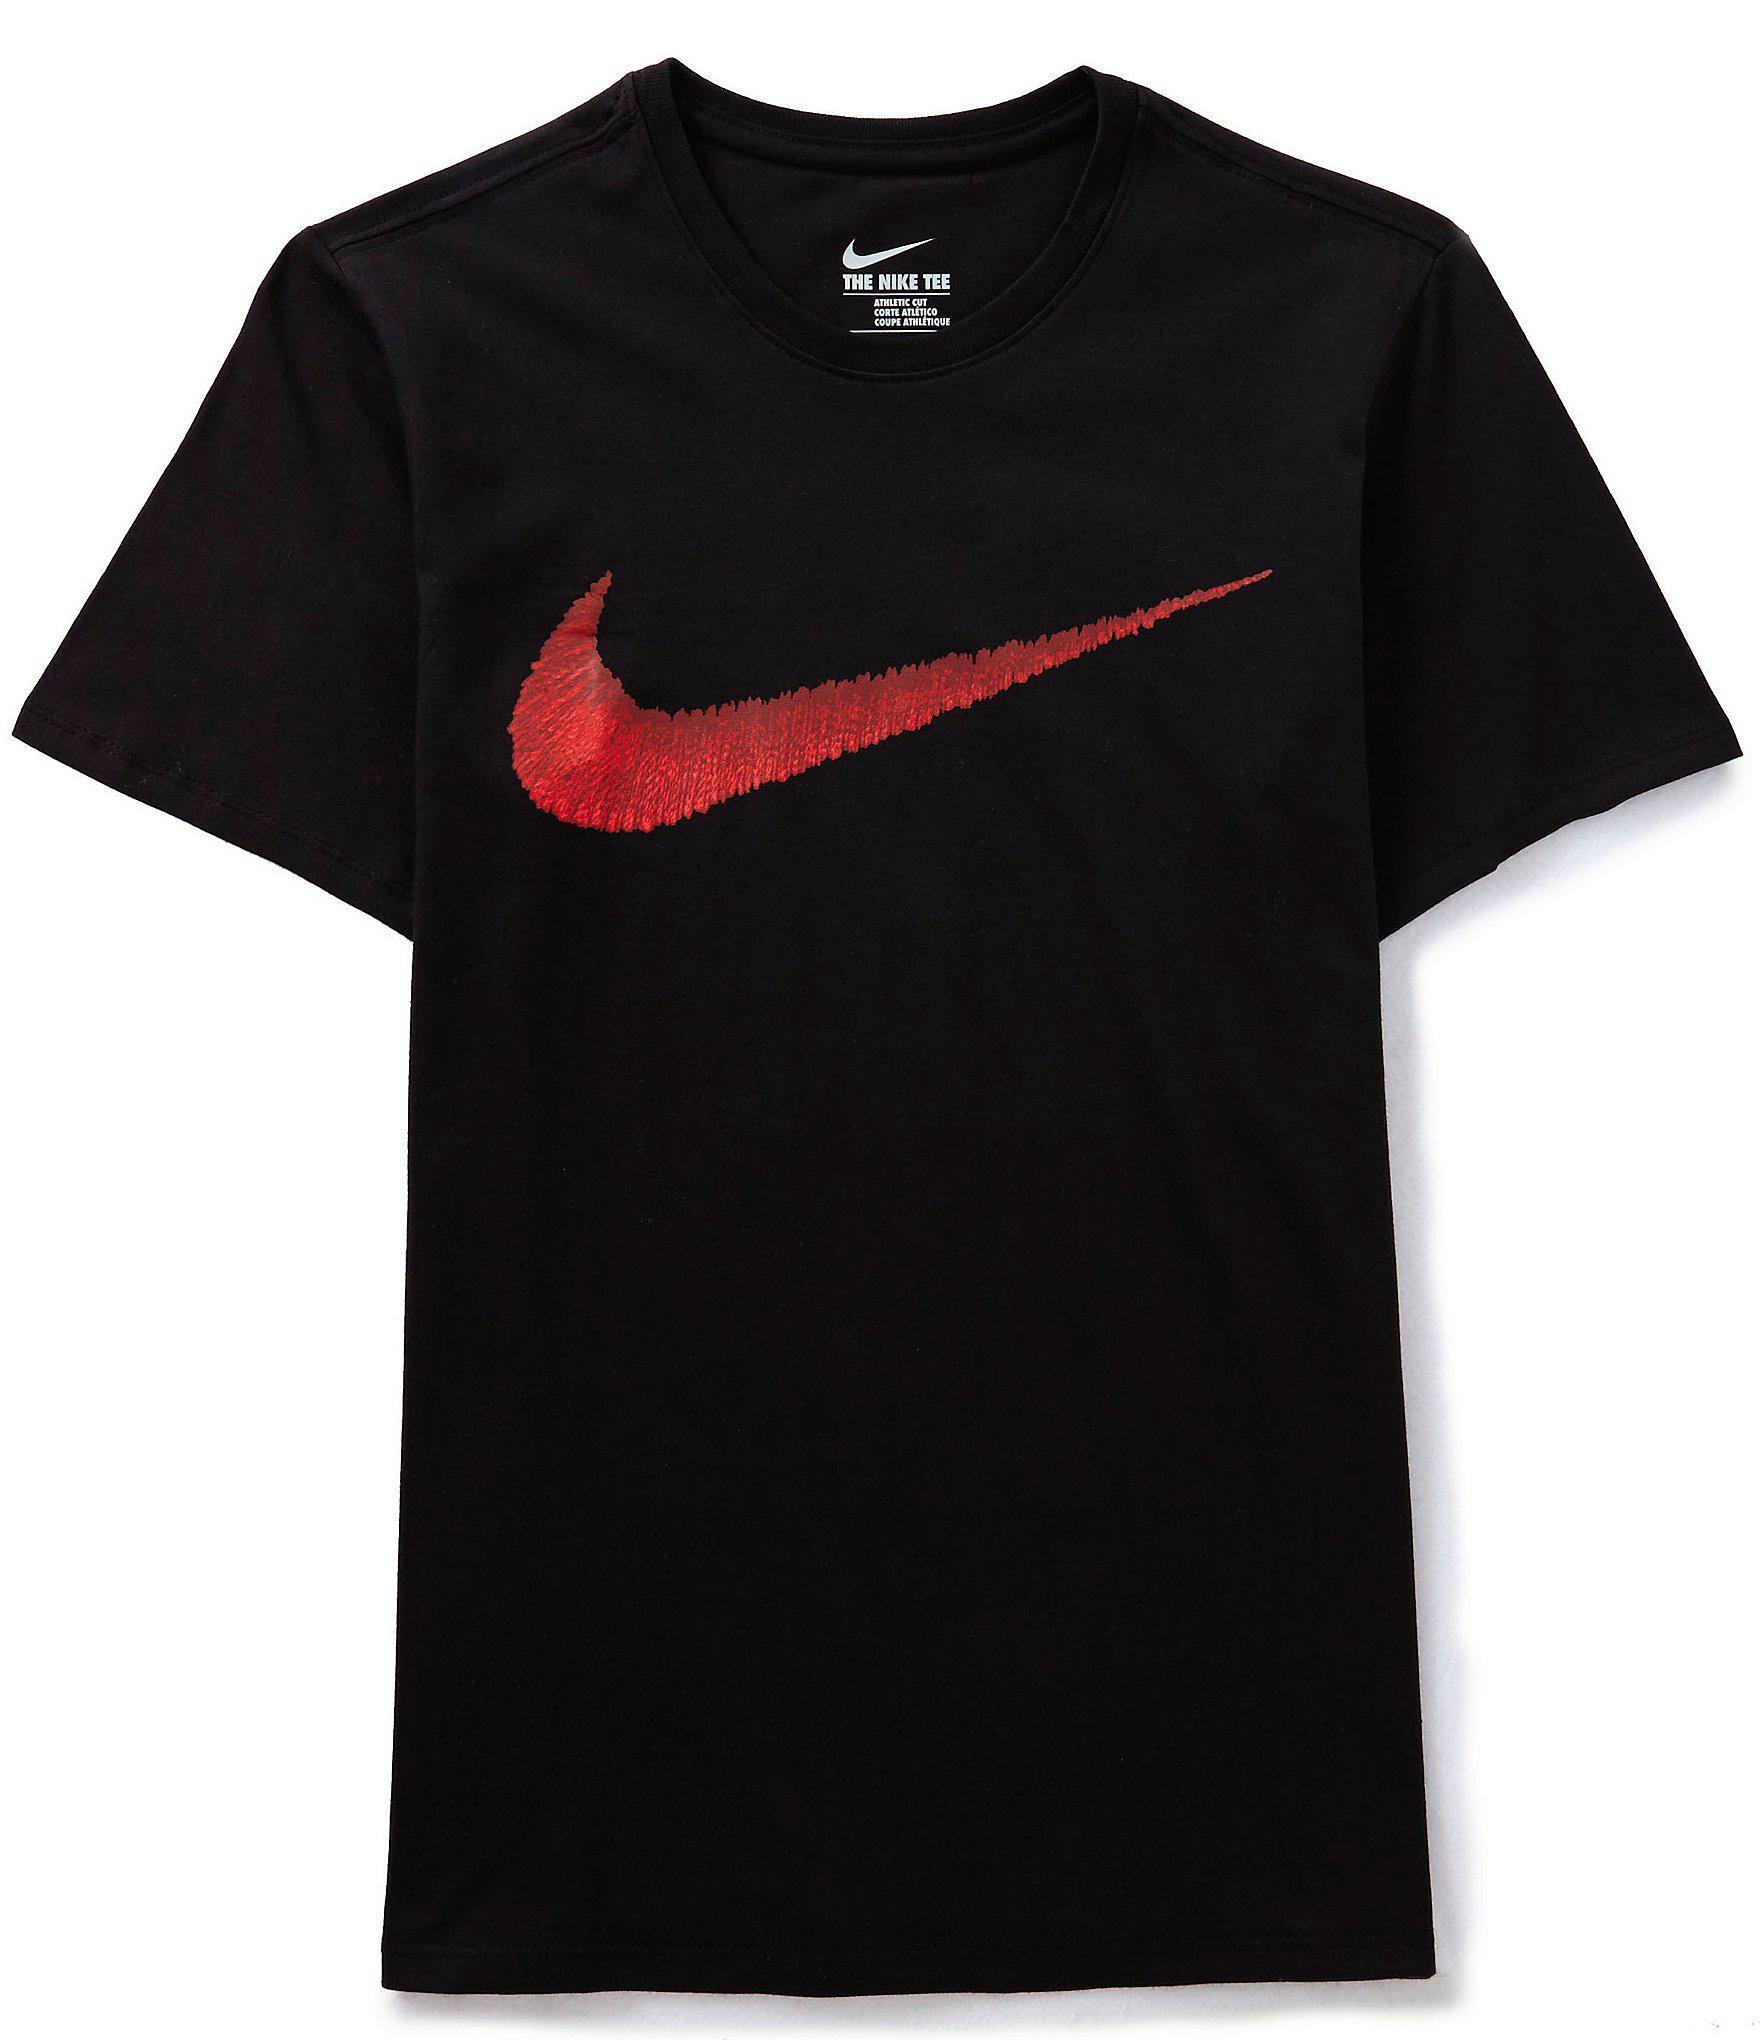 271e3a29 Lyst - Nike Big & Tall Hangtag Swoosh Short-sleeve Crewneck Graphic ...